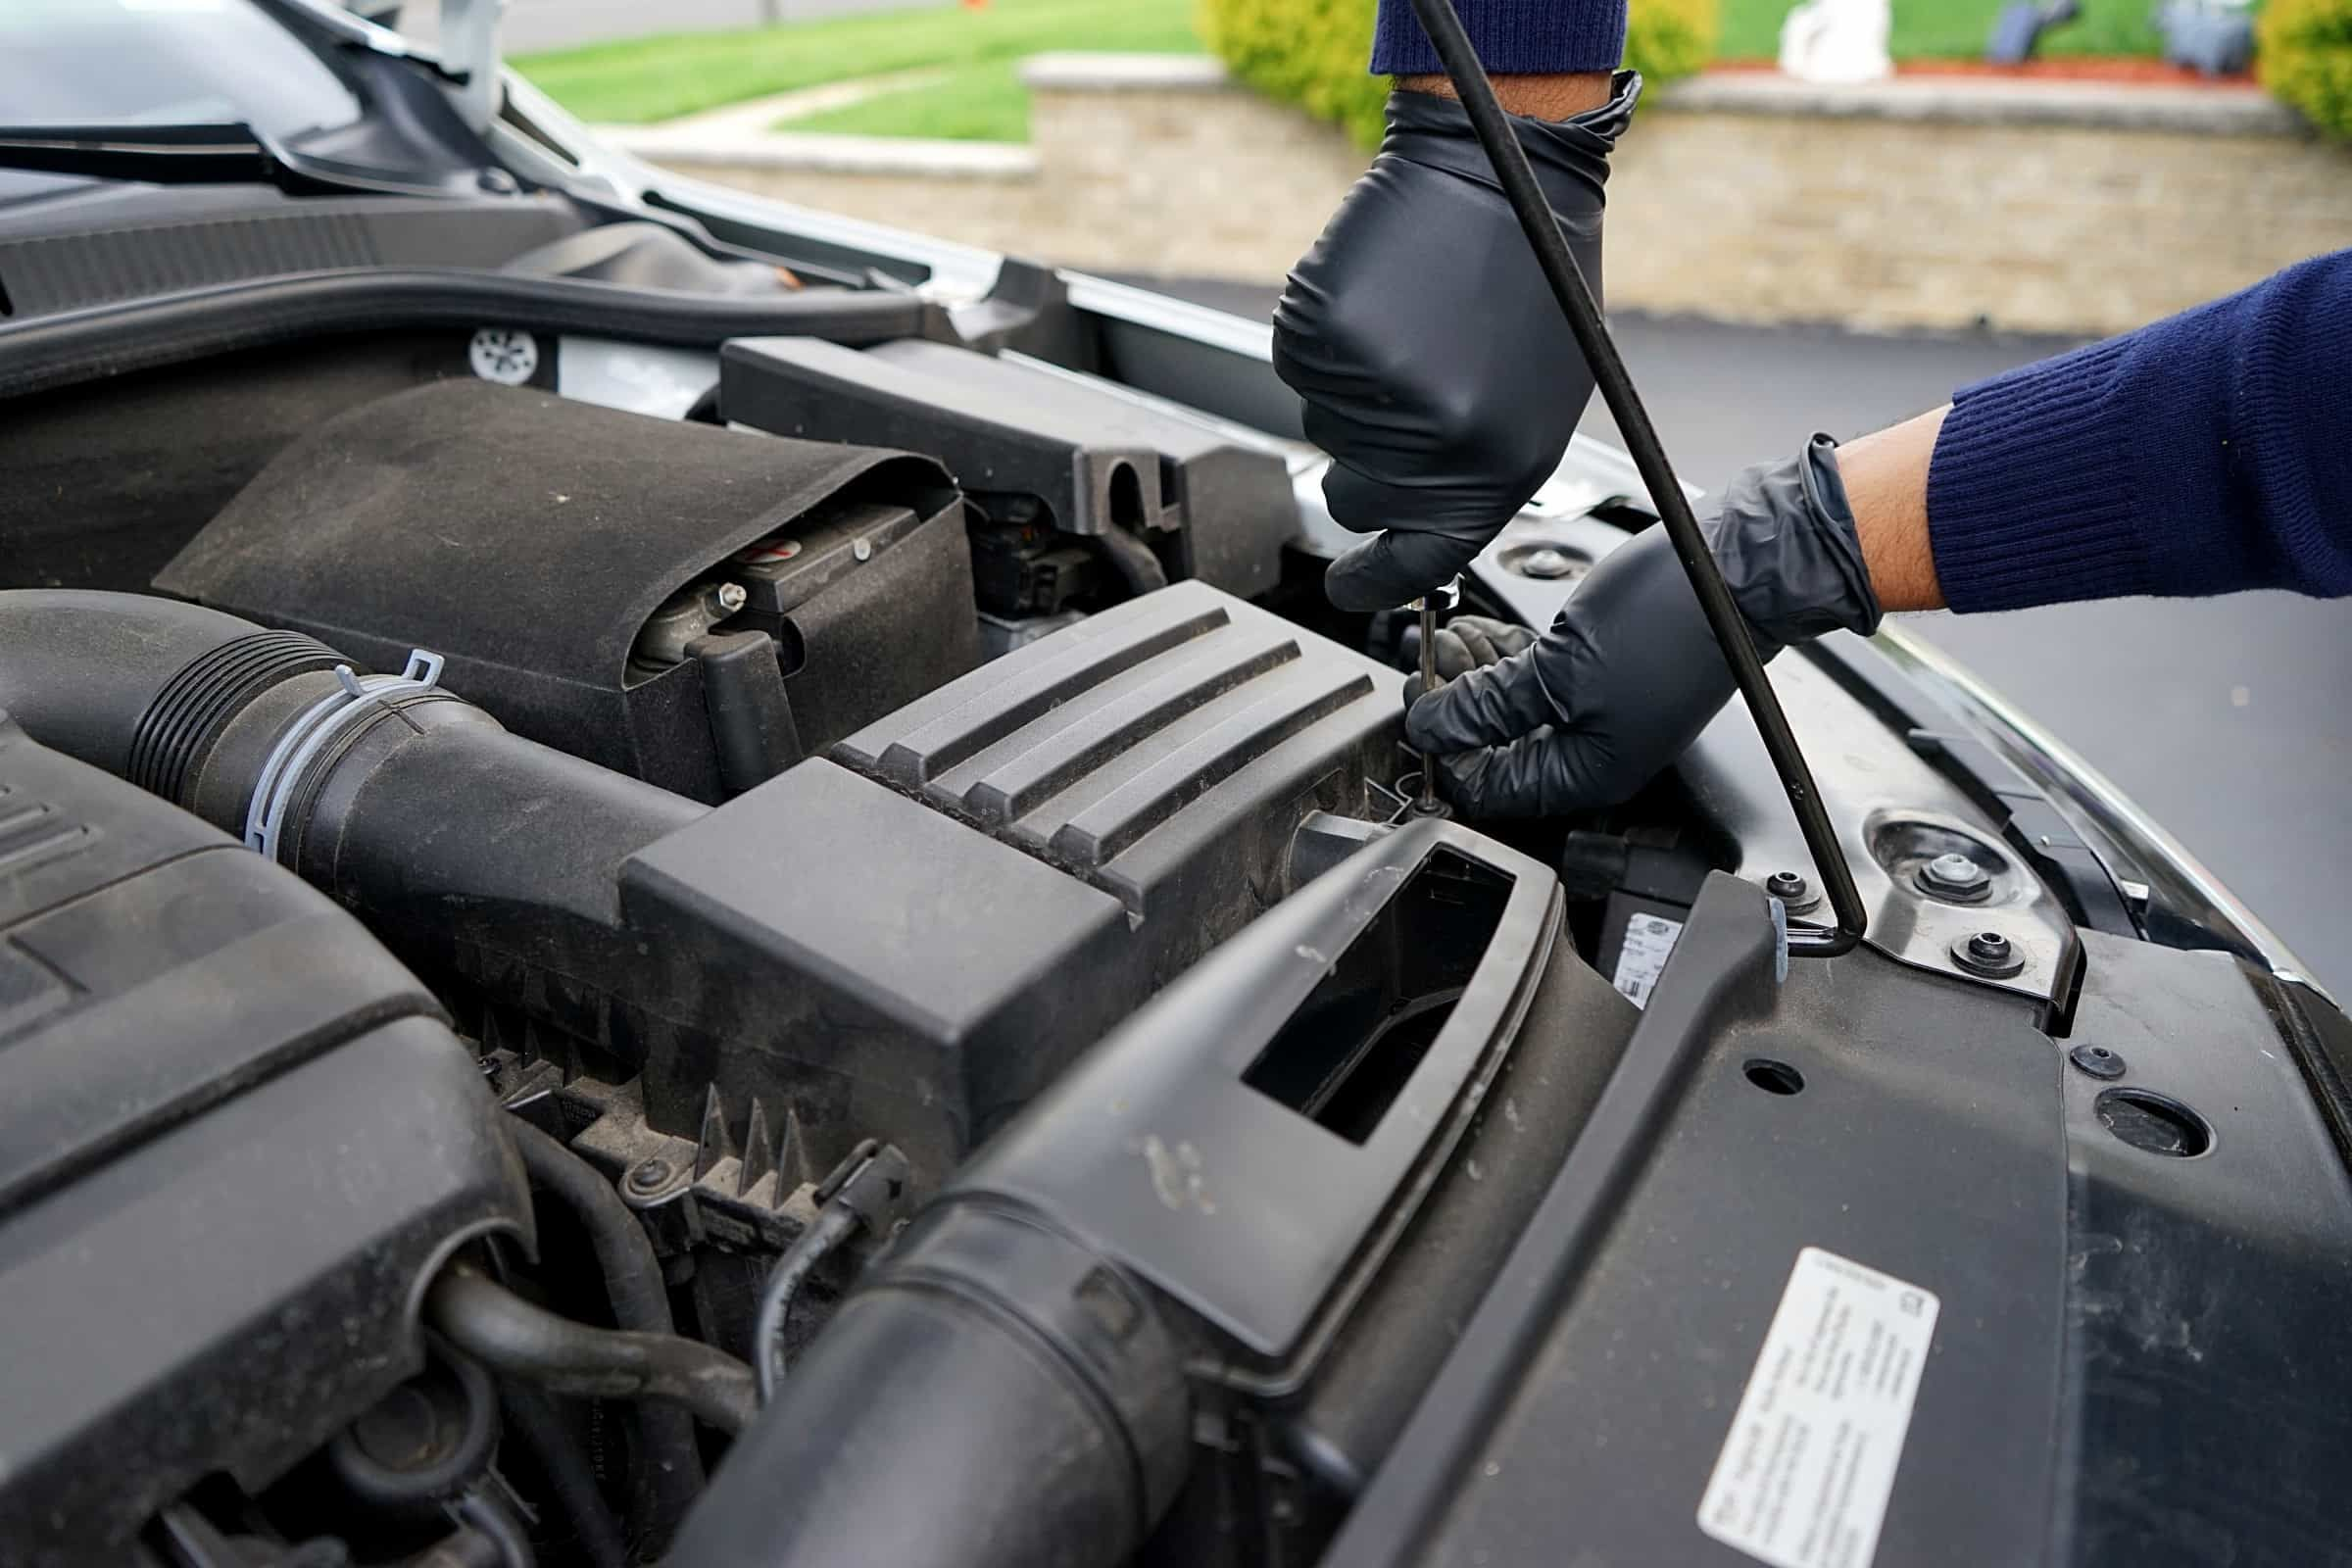 Basic Maintenance Engine Air Filter 2015 VW JETTA 1.8T